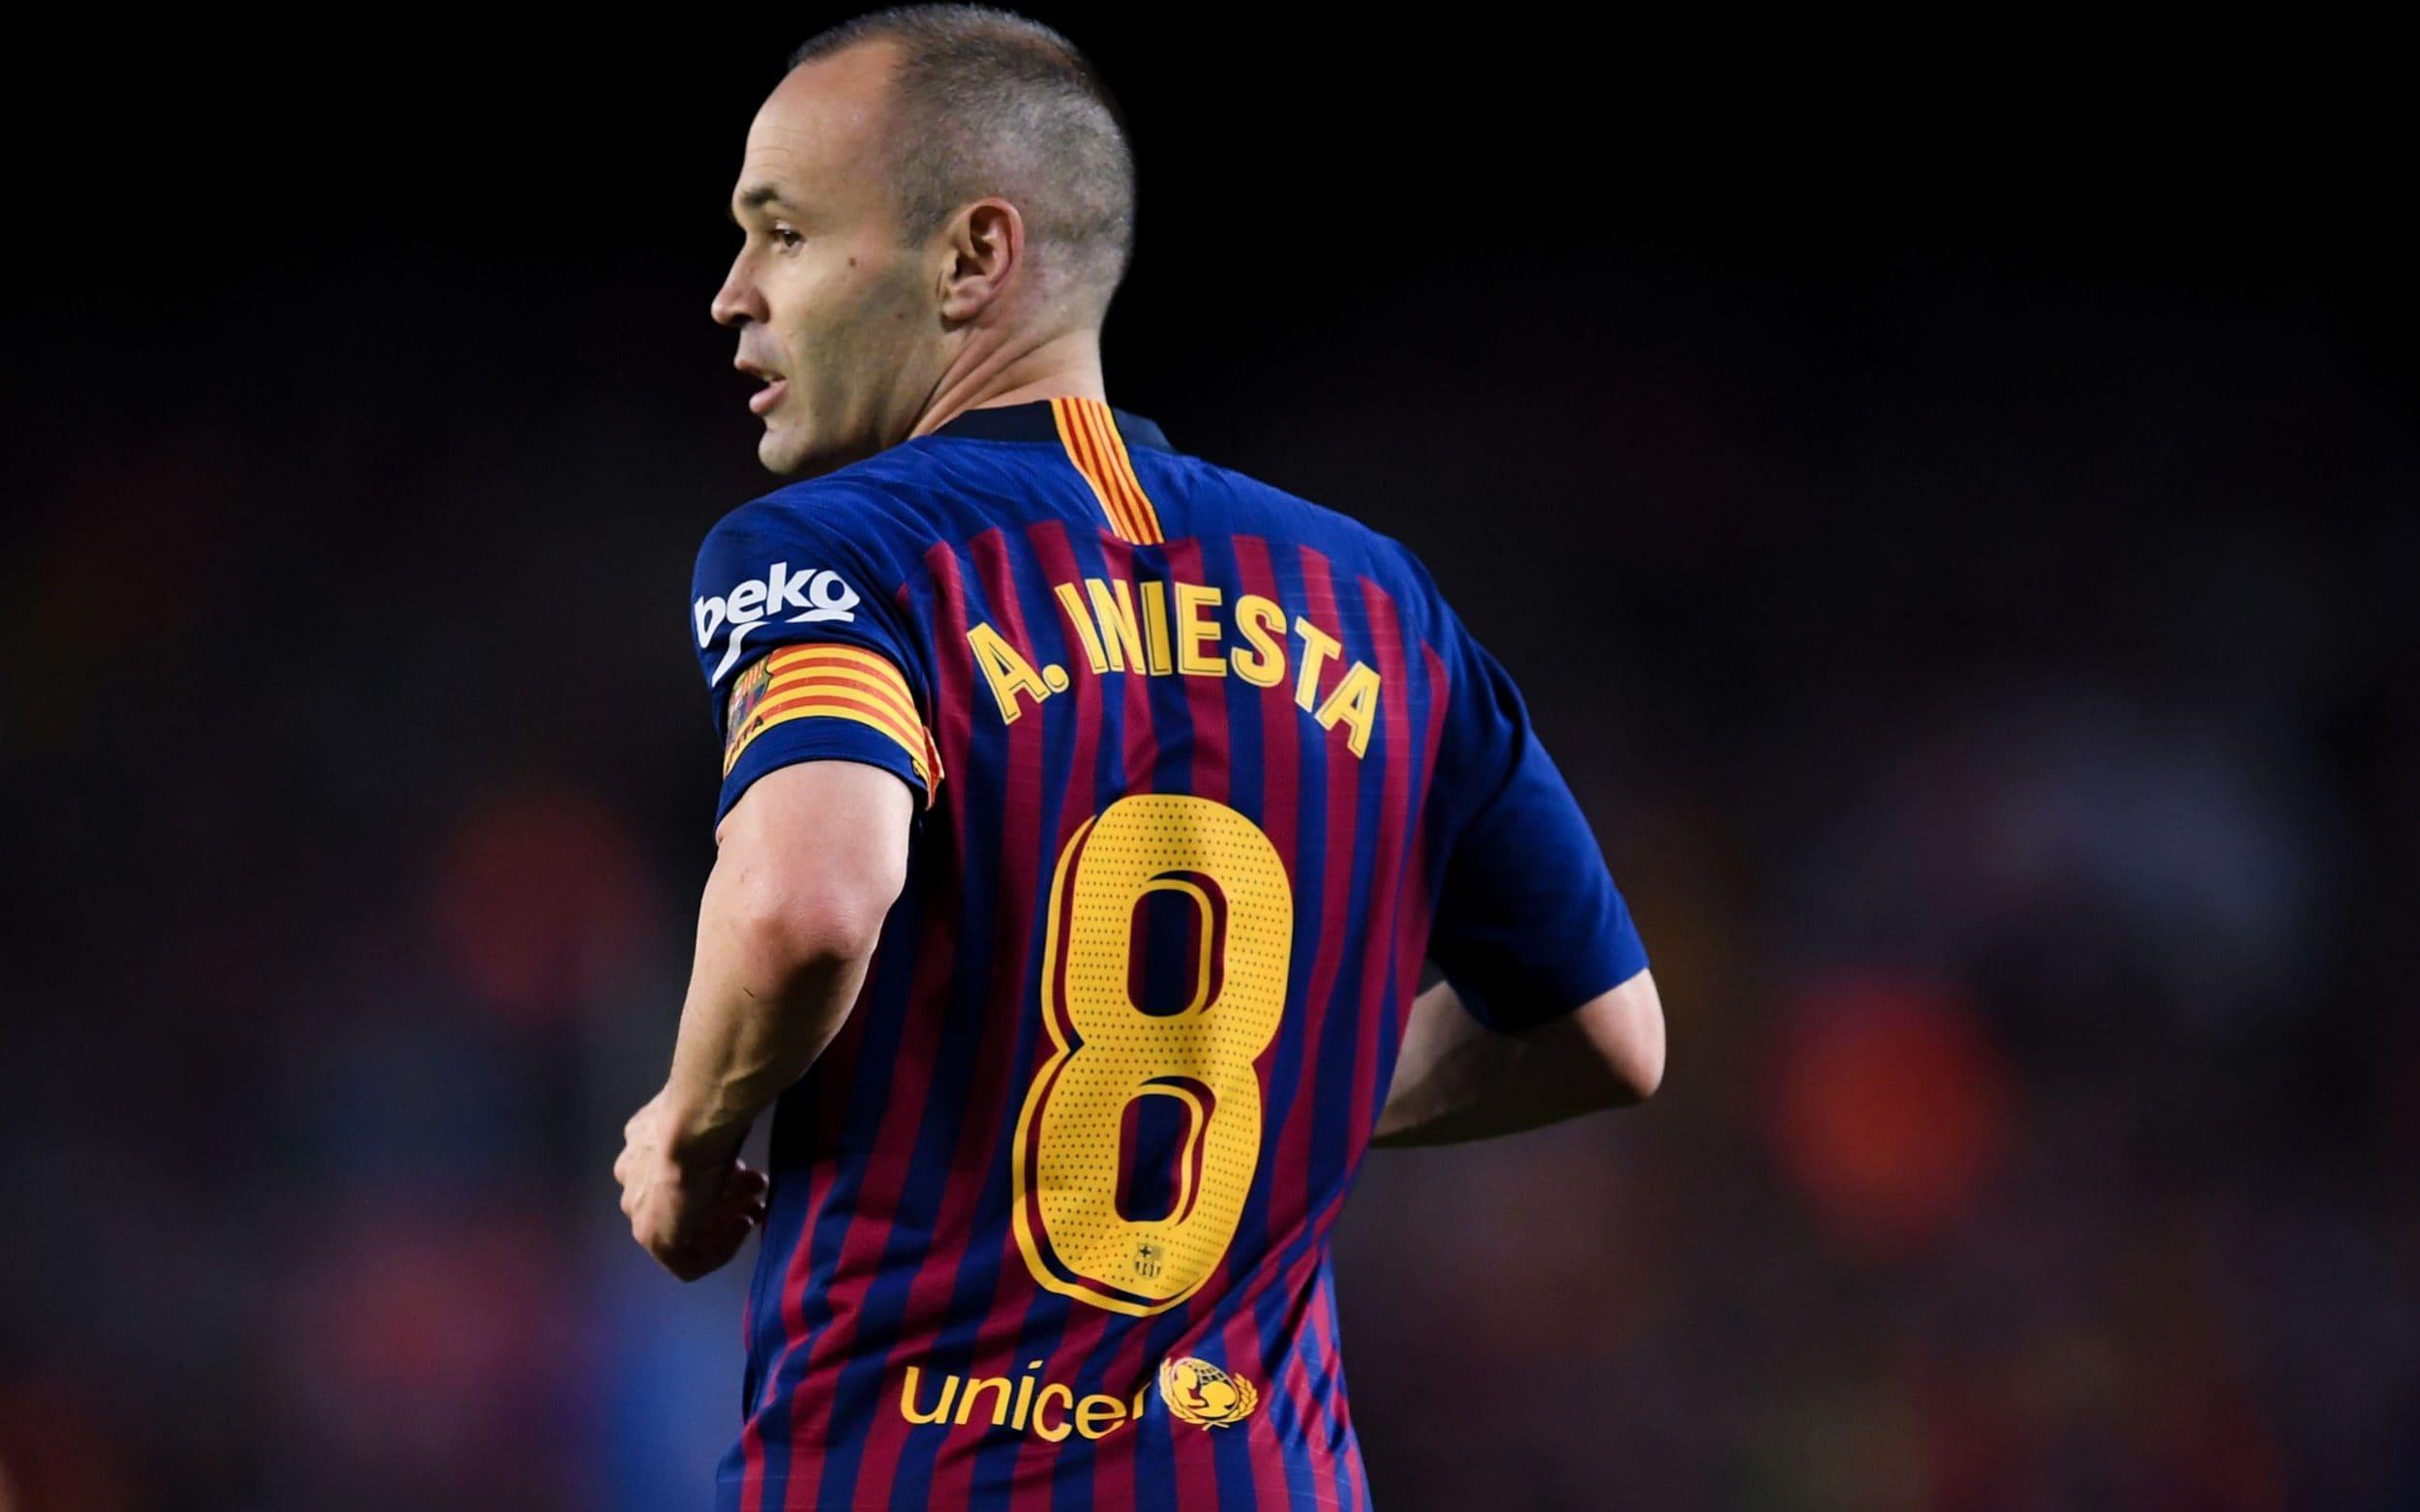 Andreas Iniesta Net Worth 2021